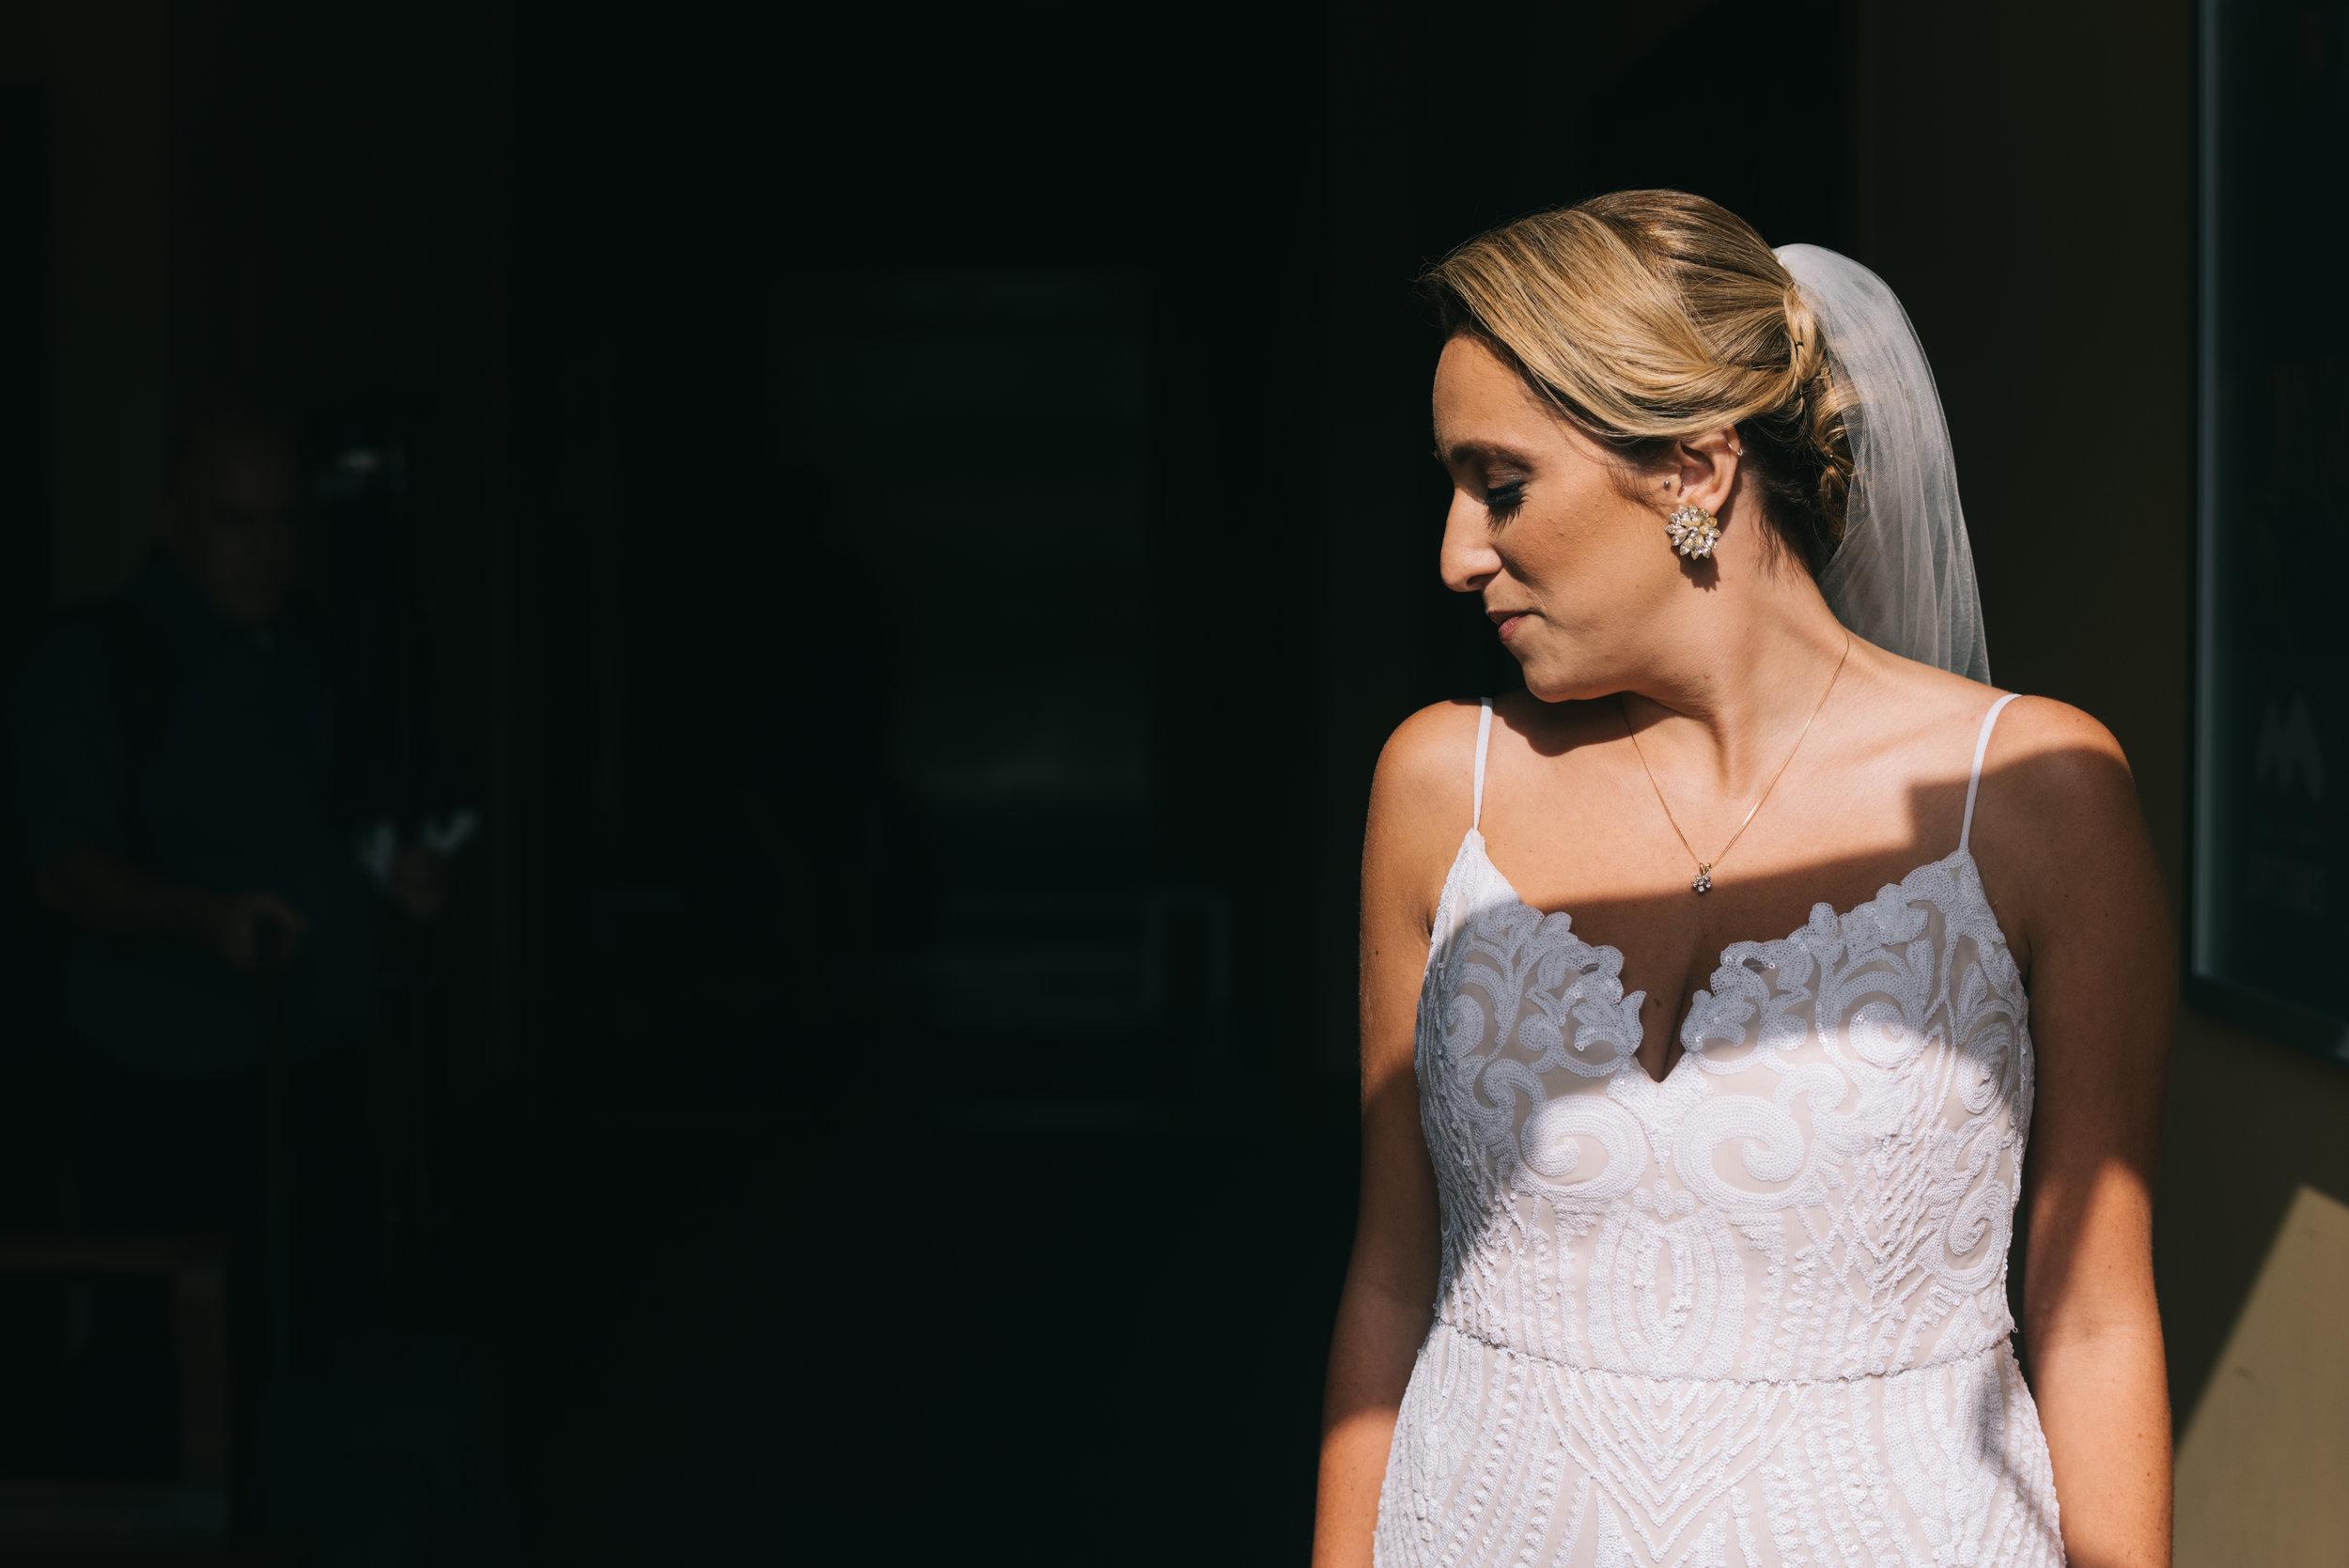 WeddingPhotos | NJPhotographer | Highlights-5-22.jpg